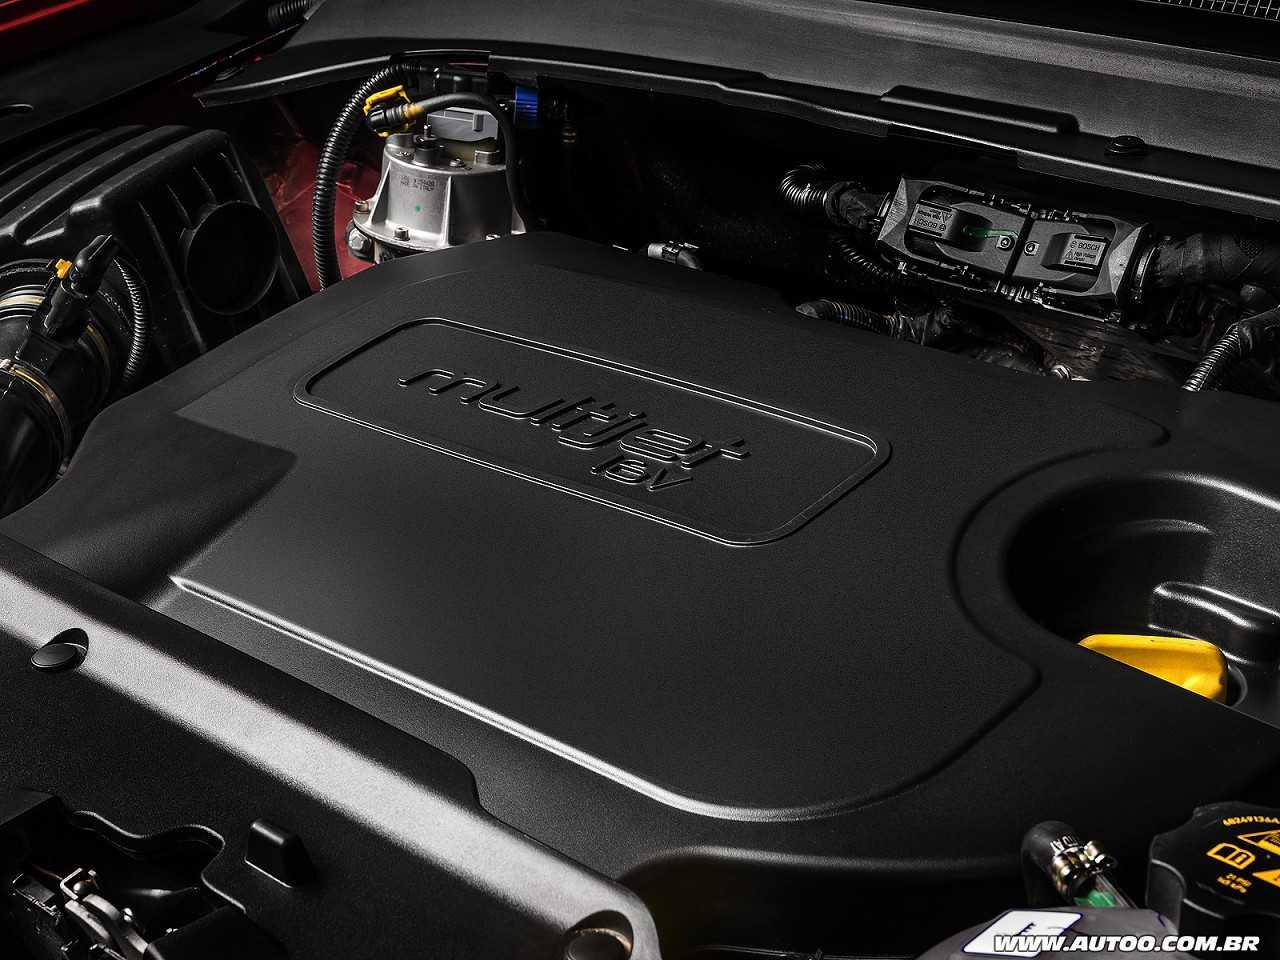 JeepCompass 2018 - motor